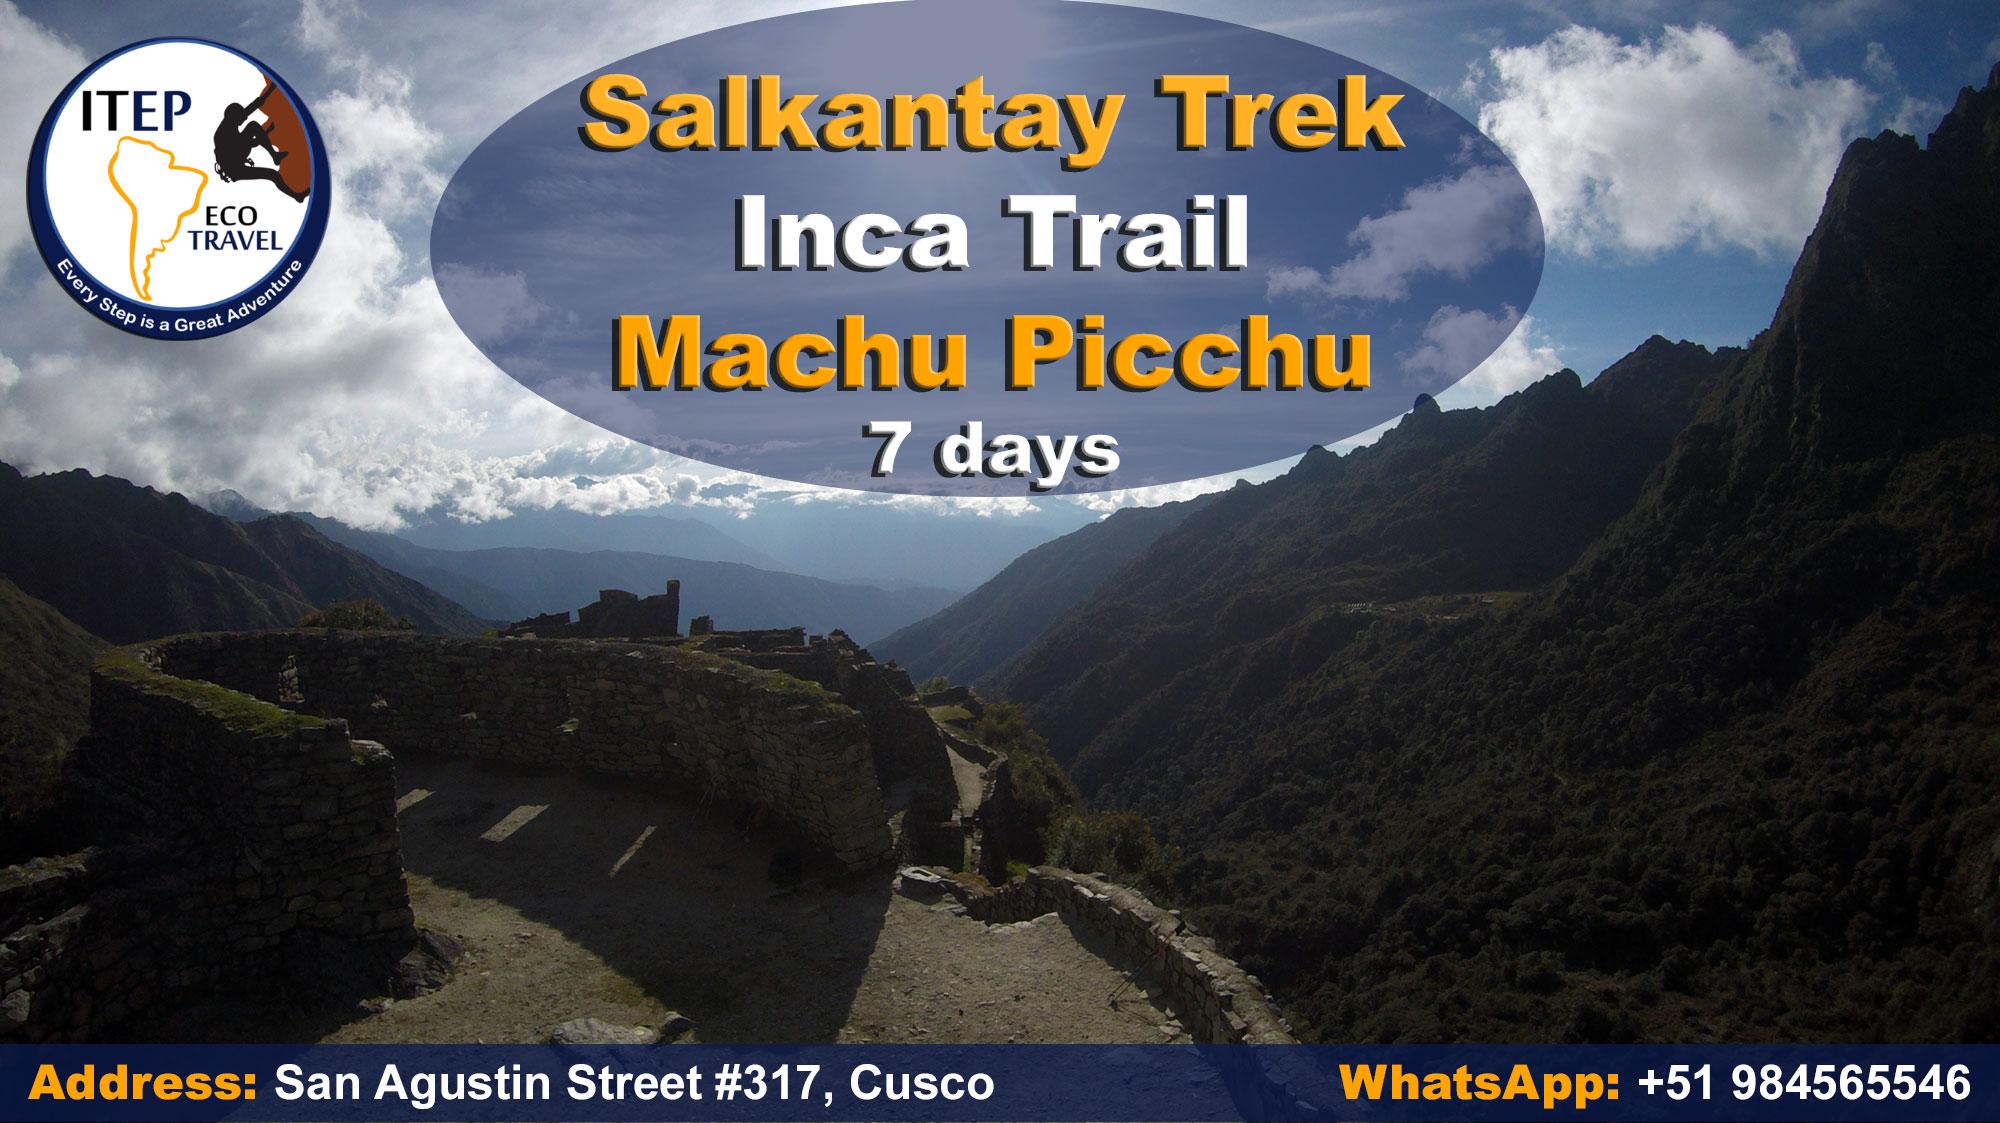 salkantay trek,inca trail,machu picchu,adventure,trek